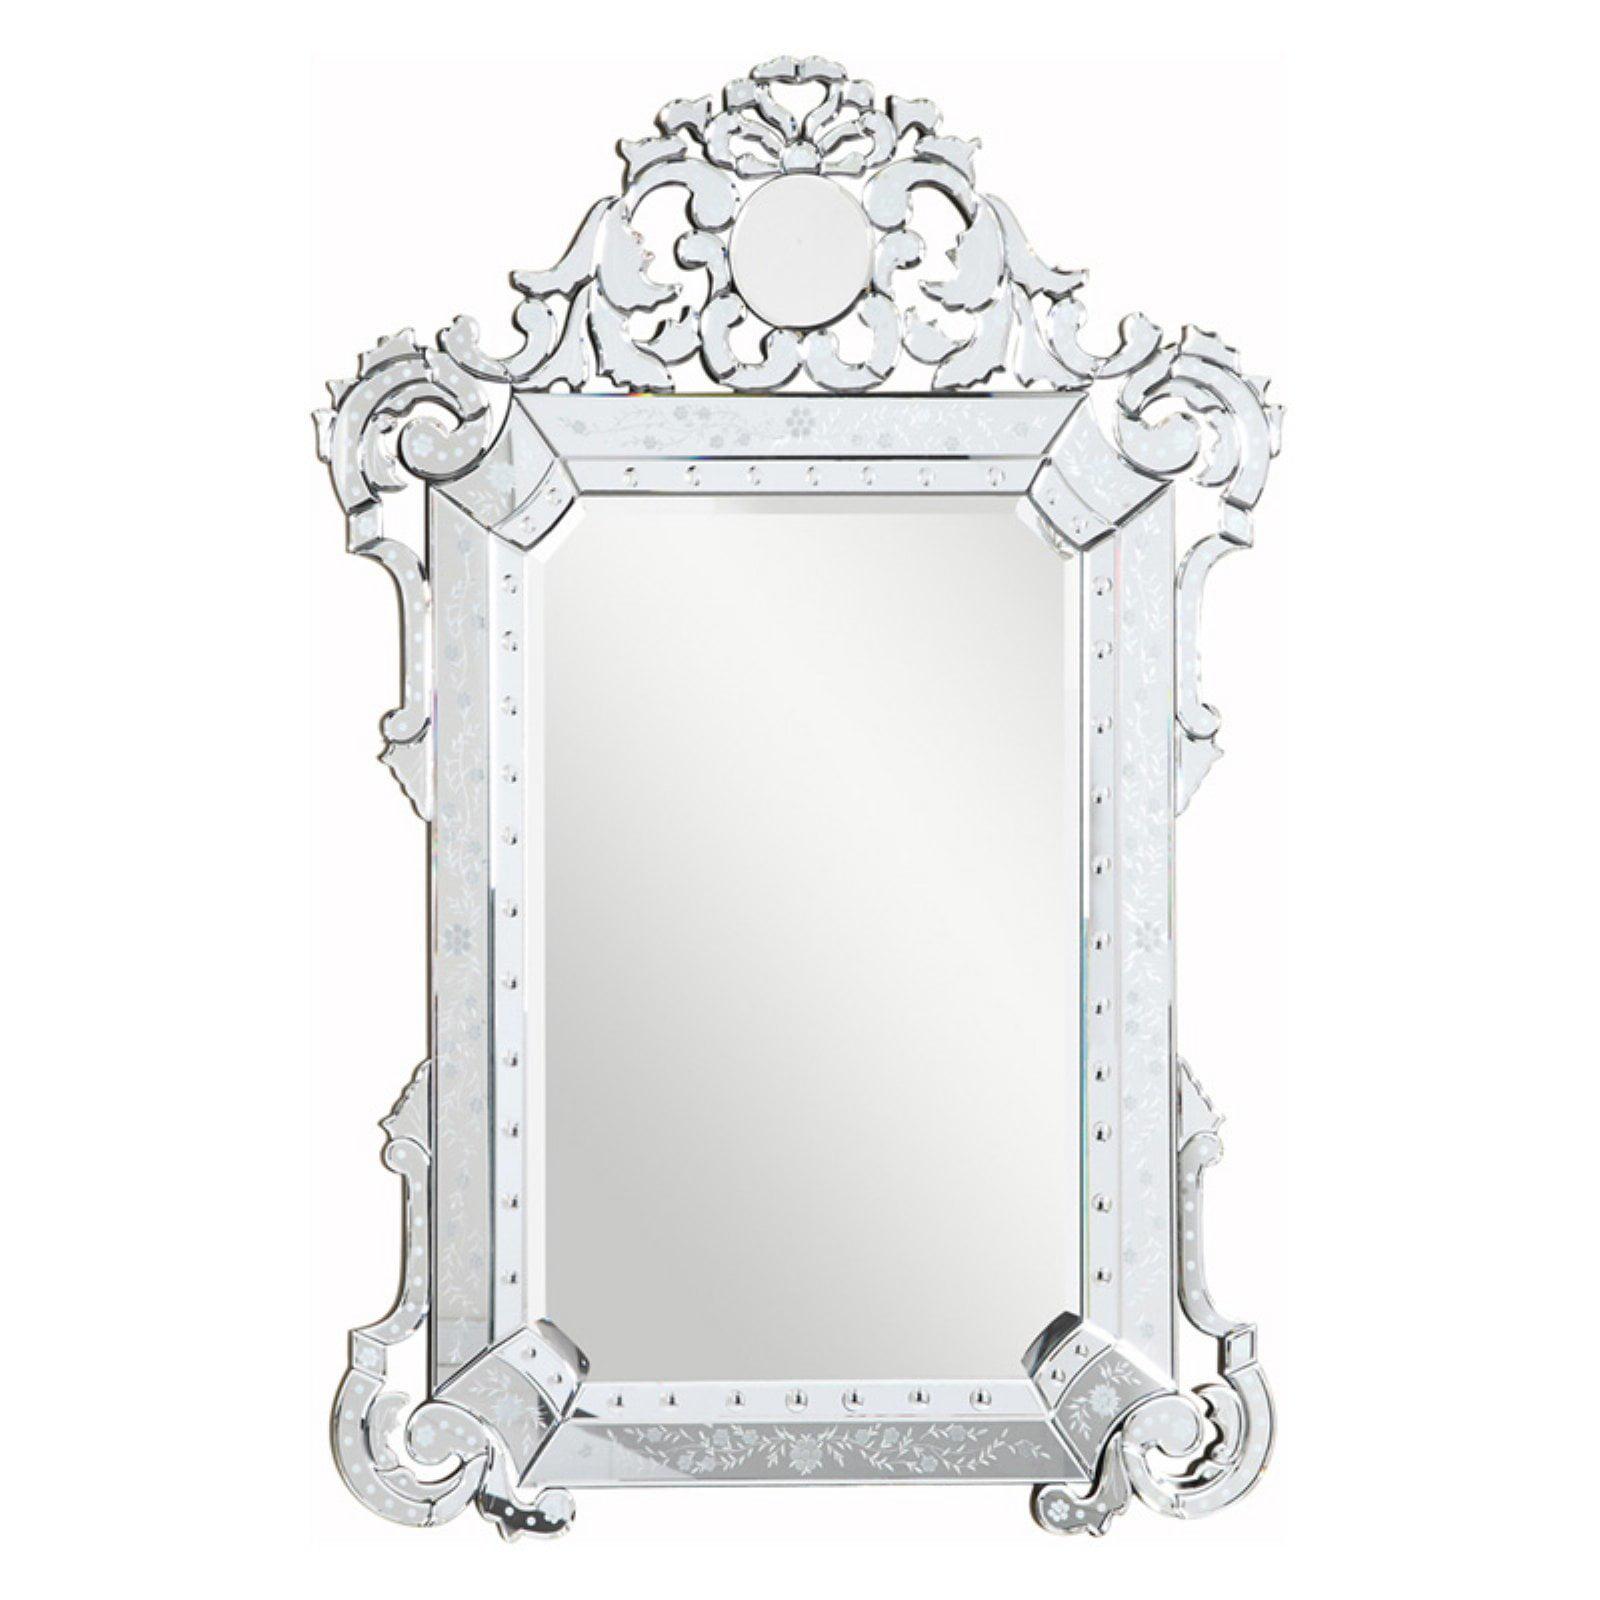 Elegant Furniture & Lighting Venetian Wall Mirror 39.25W x 55.25H in. by Elegant Lighting